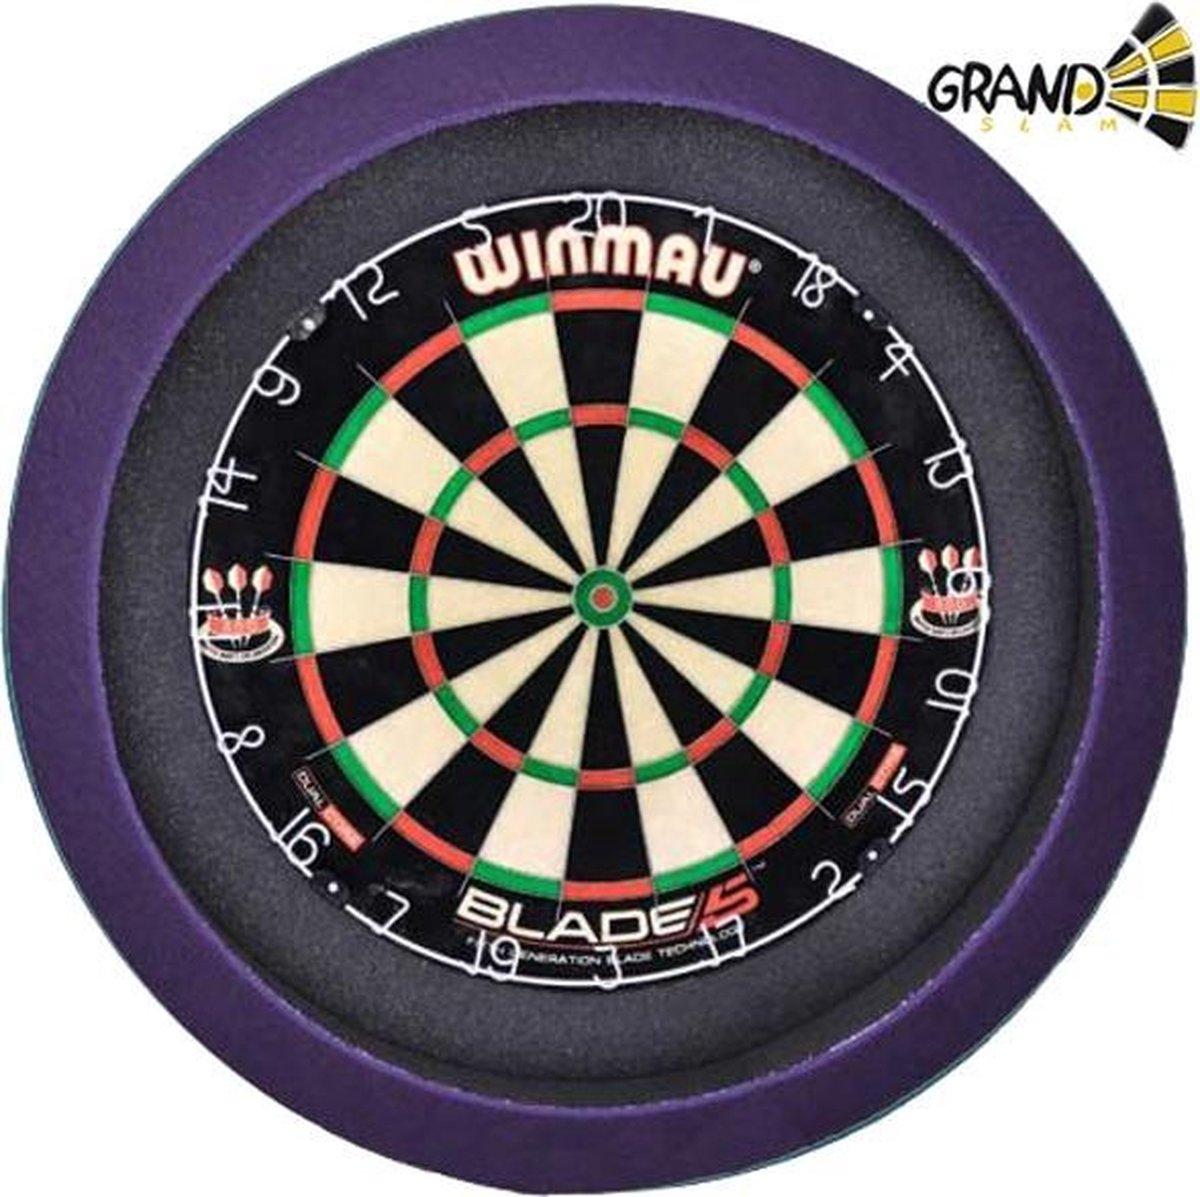 Grandslam Dartbord Verlichting 3.0 (Paars)